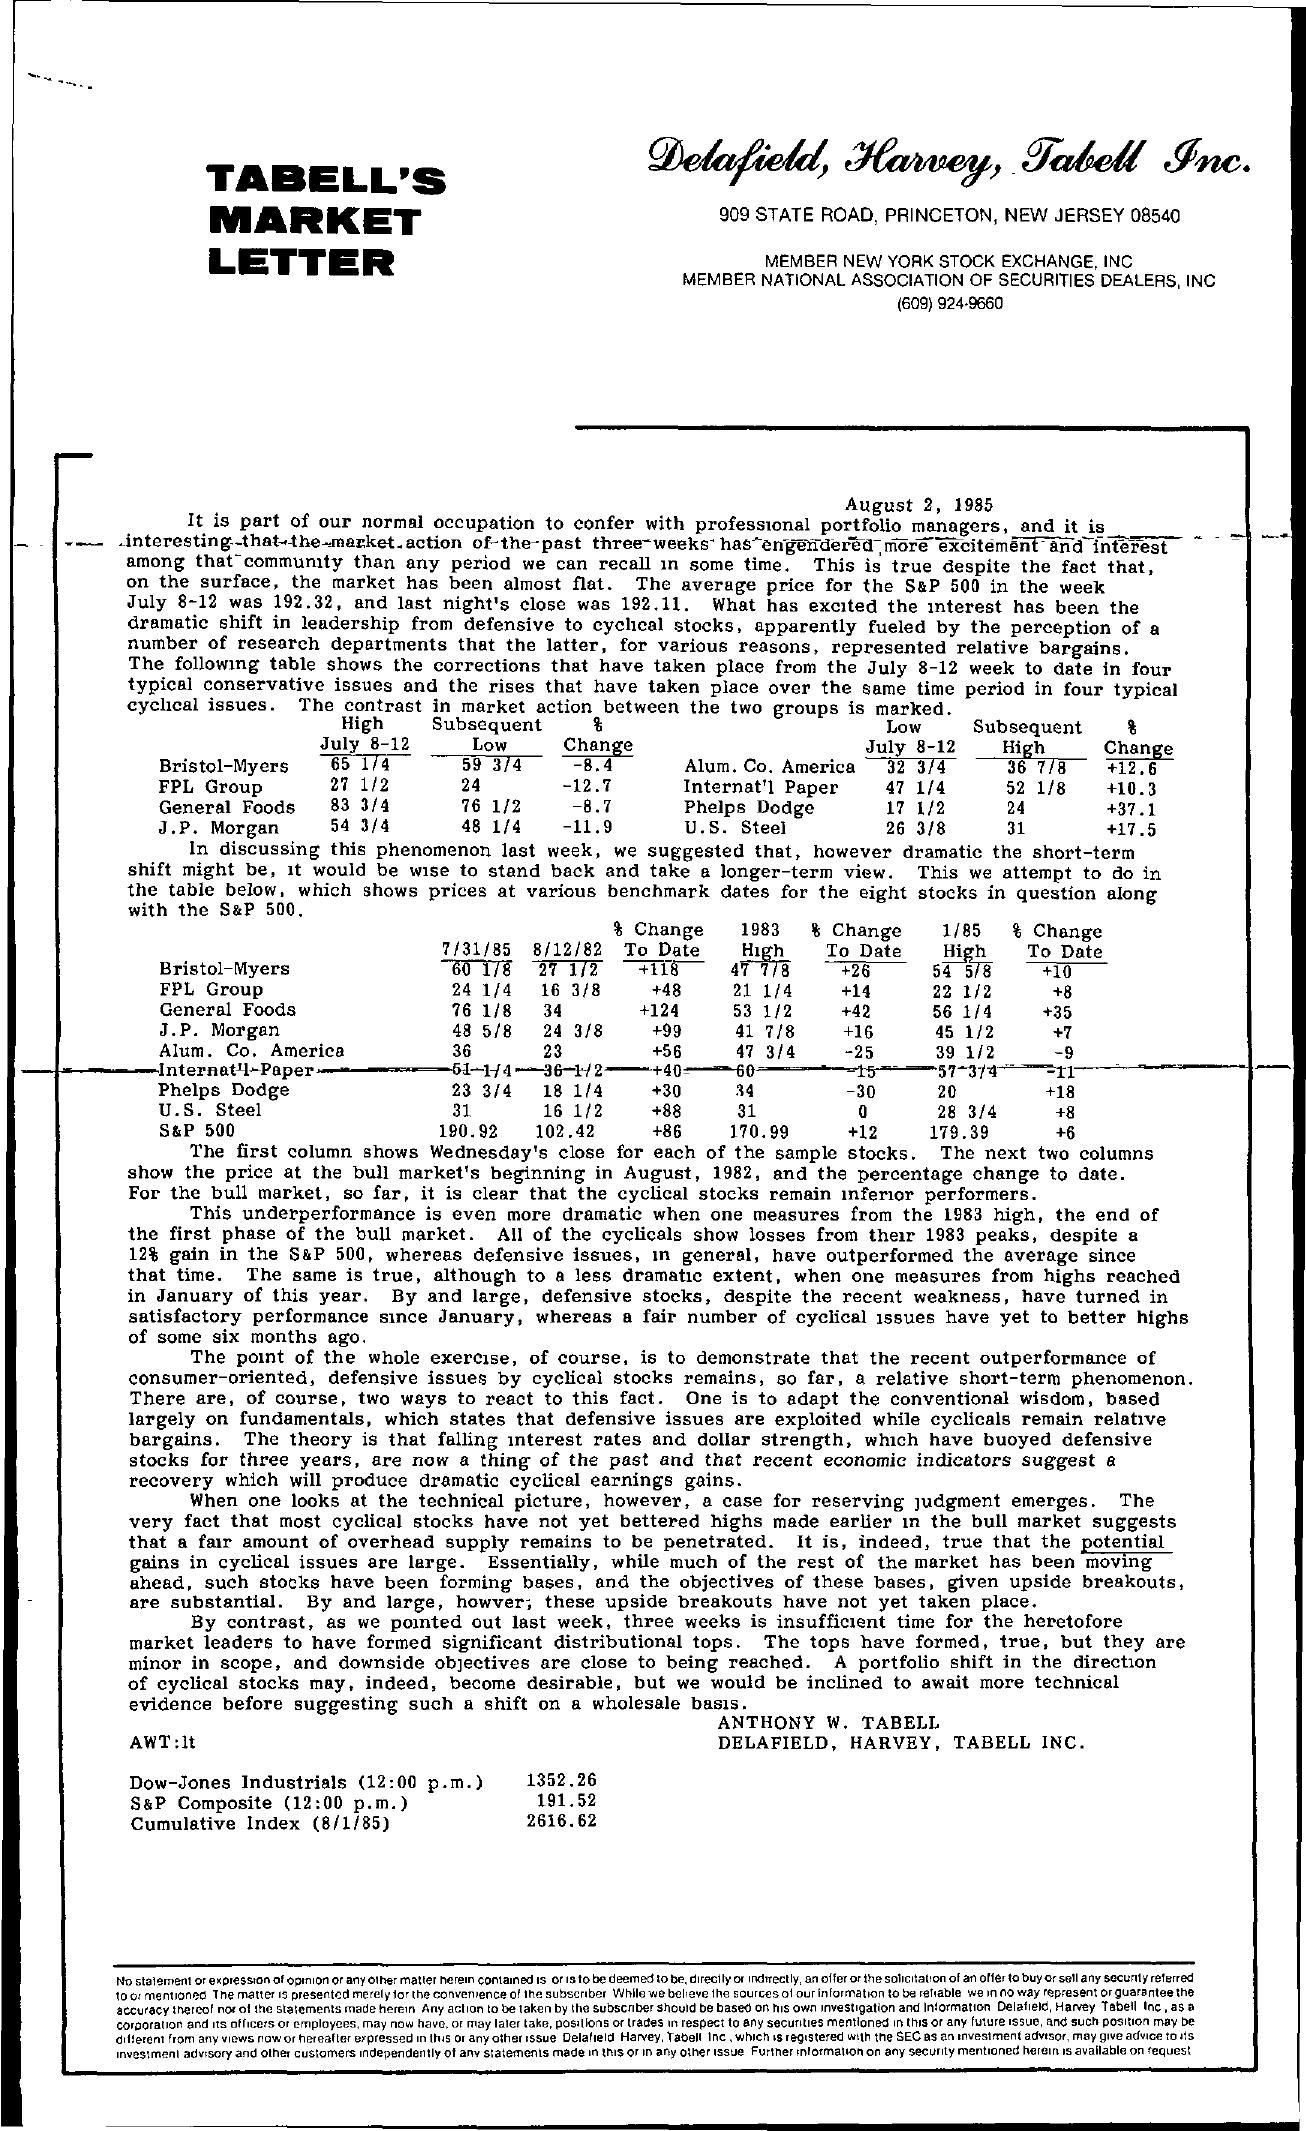 Tabell's Market Letter - August 02, 1985